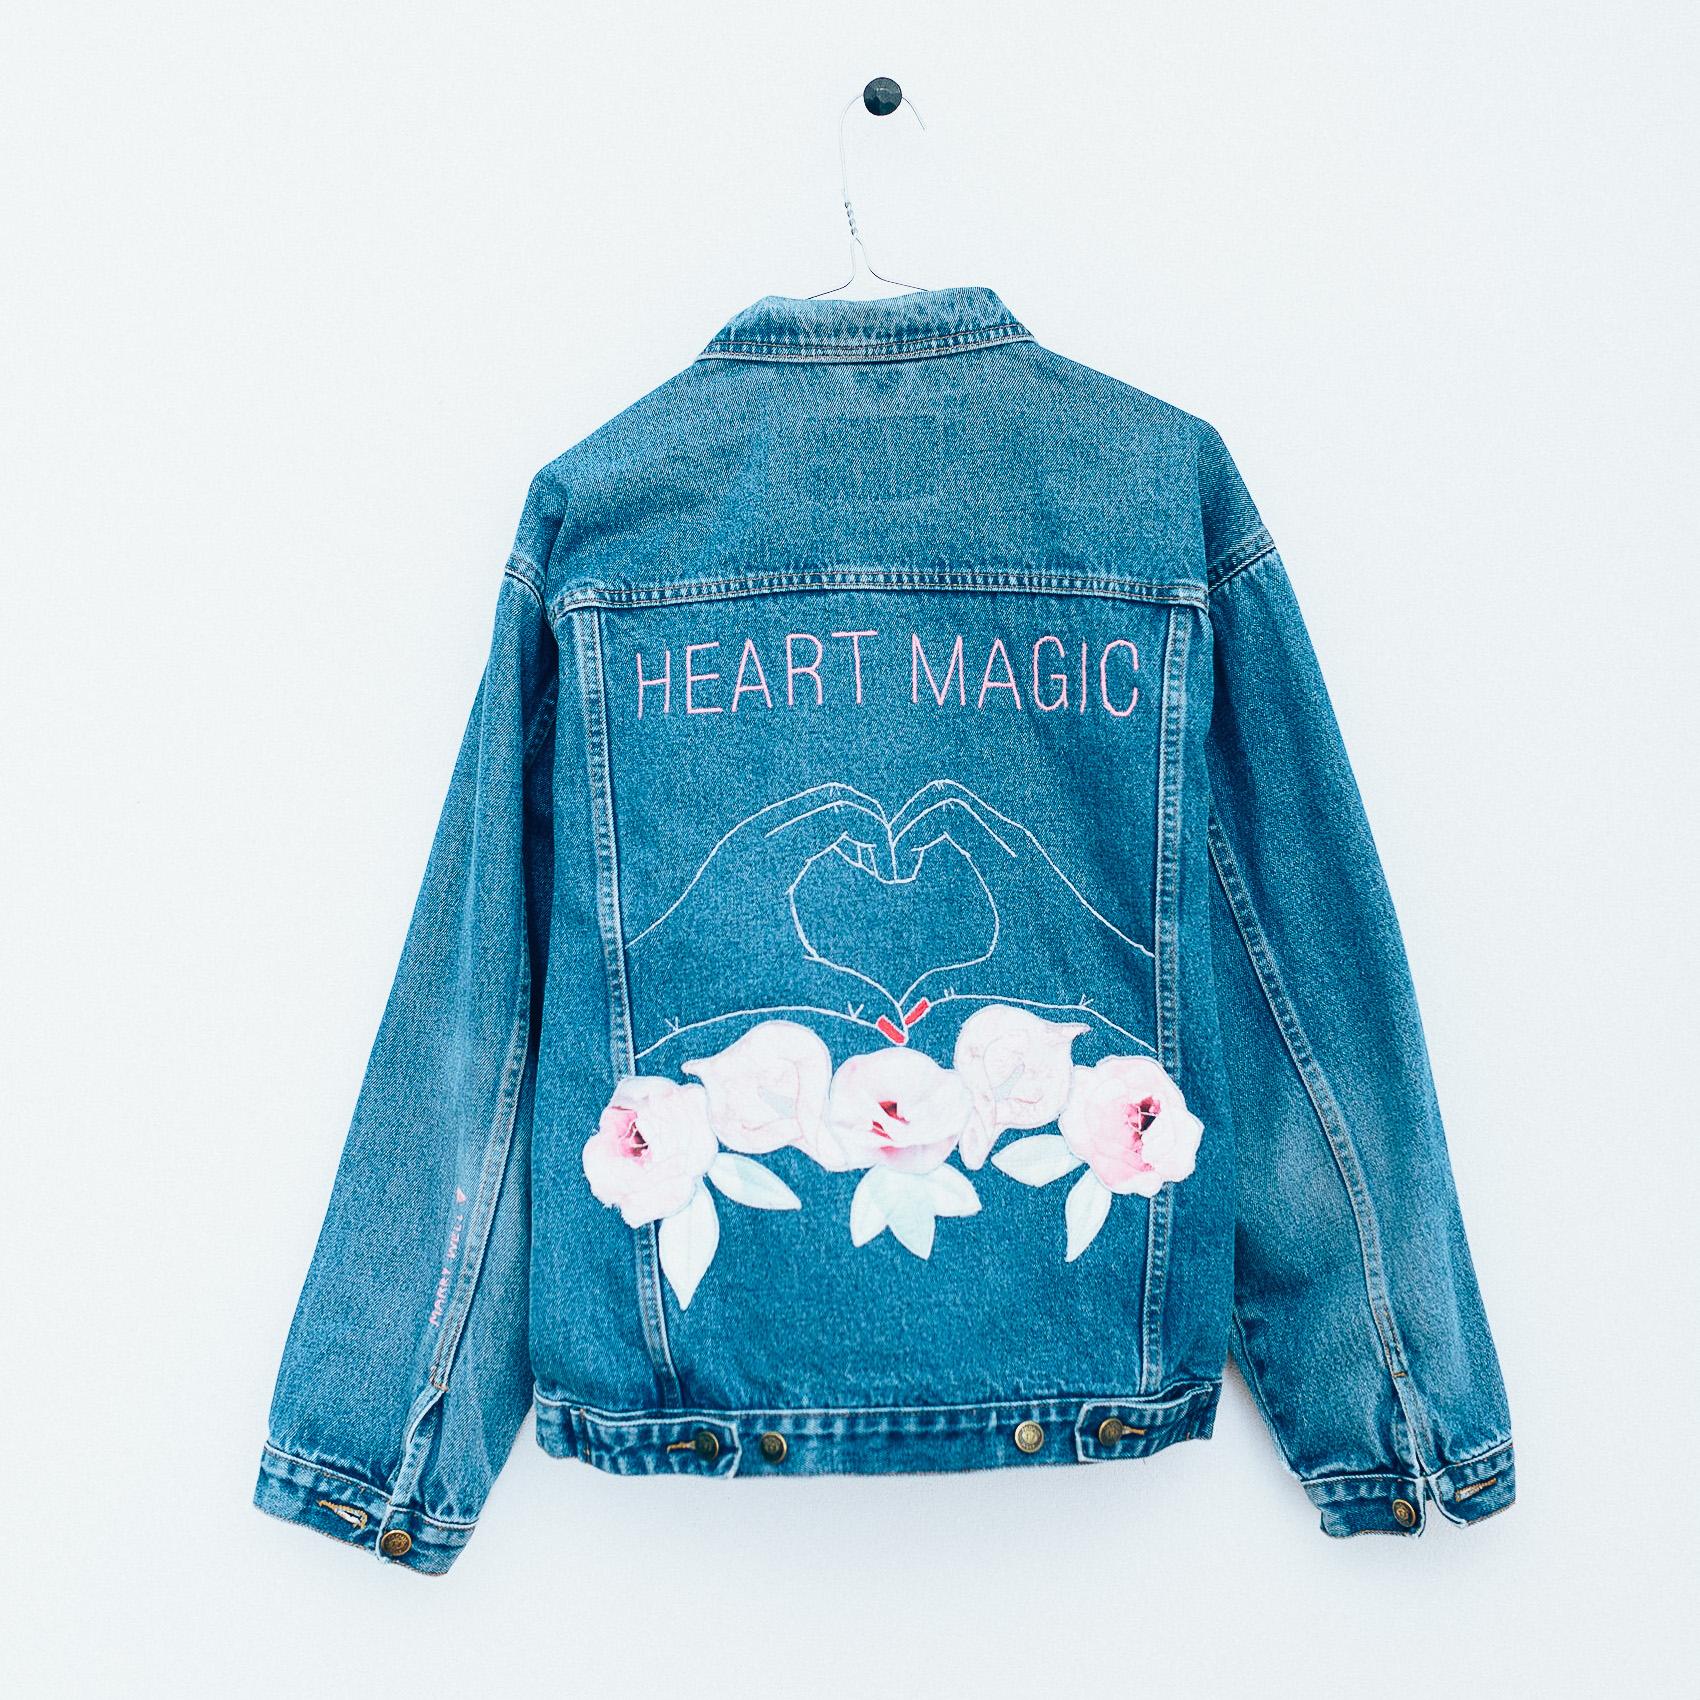 Margrethe_bridal jacket_a couple_pocket pocket_2.jpg